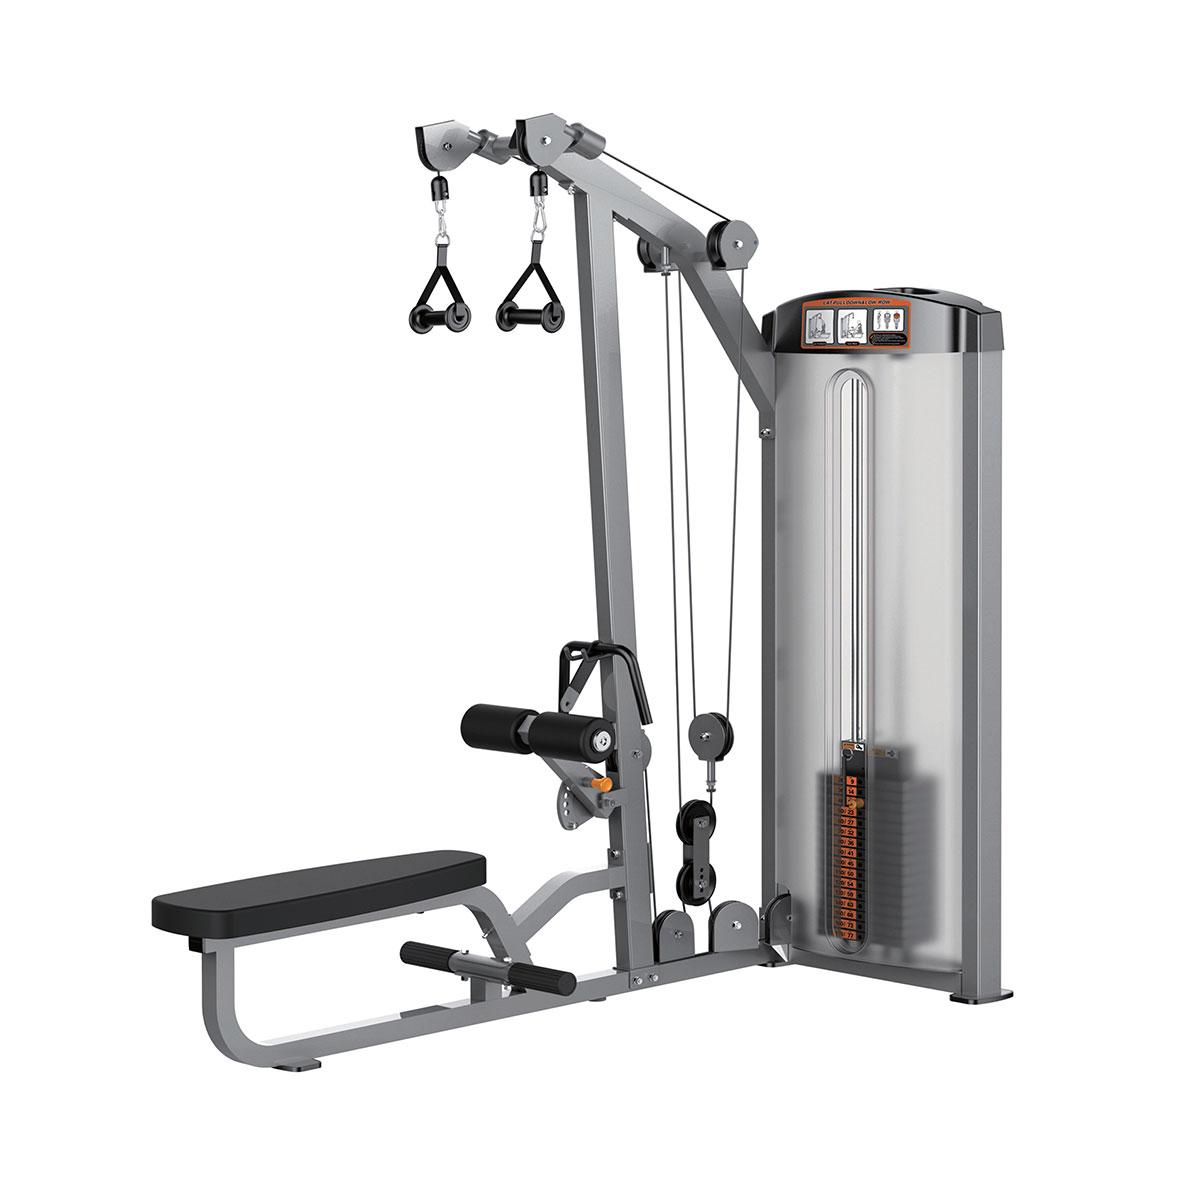 Lat Pulldown / Low Row - 250 lbs